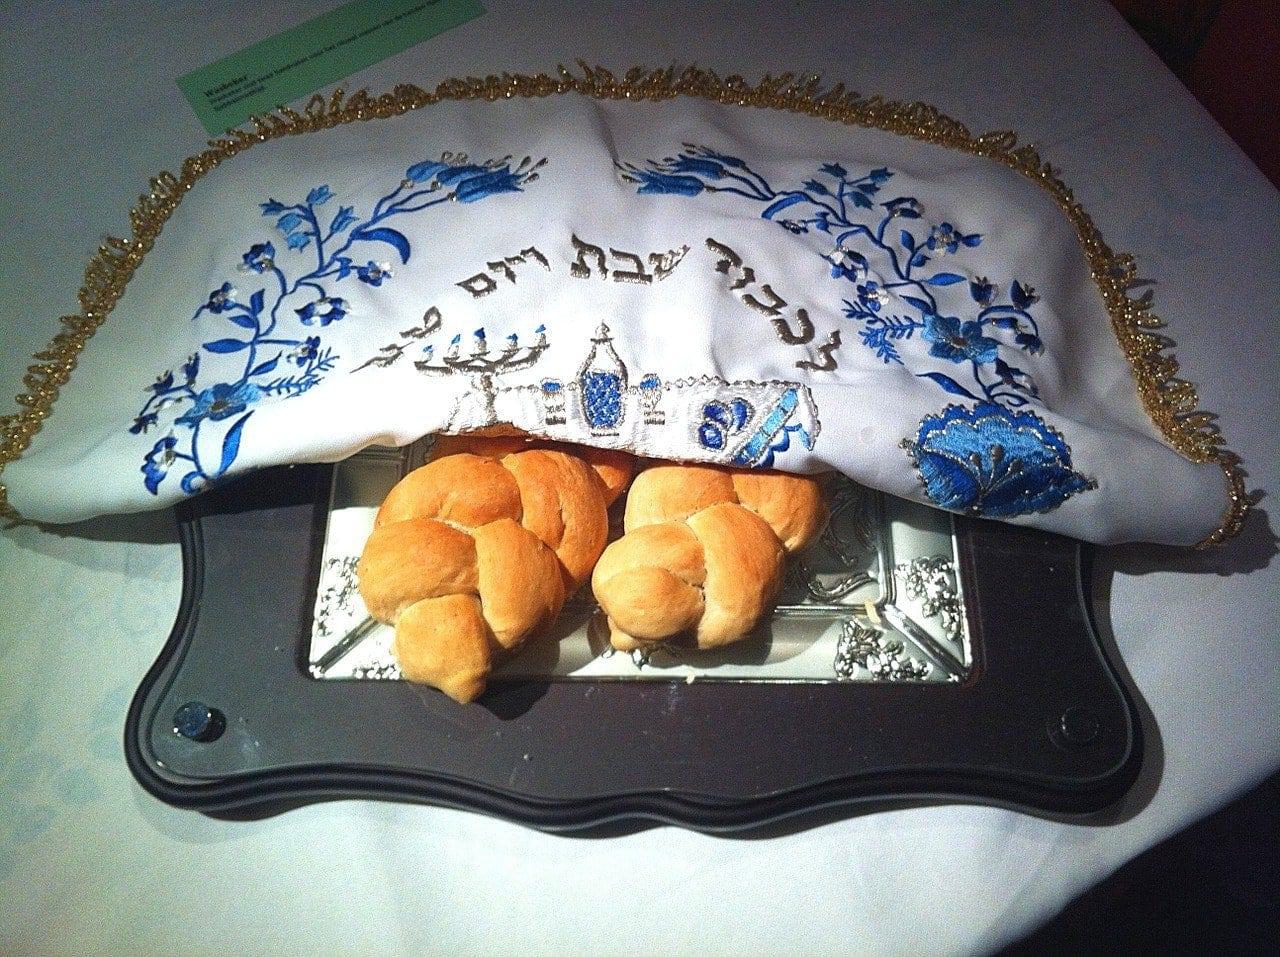 Recipe for Shabbat challah